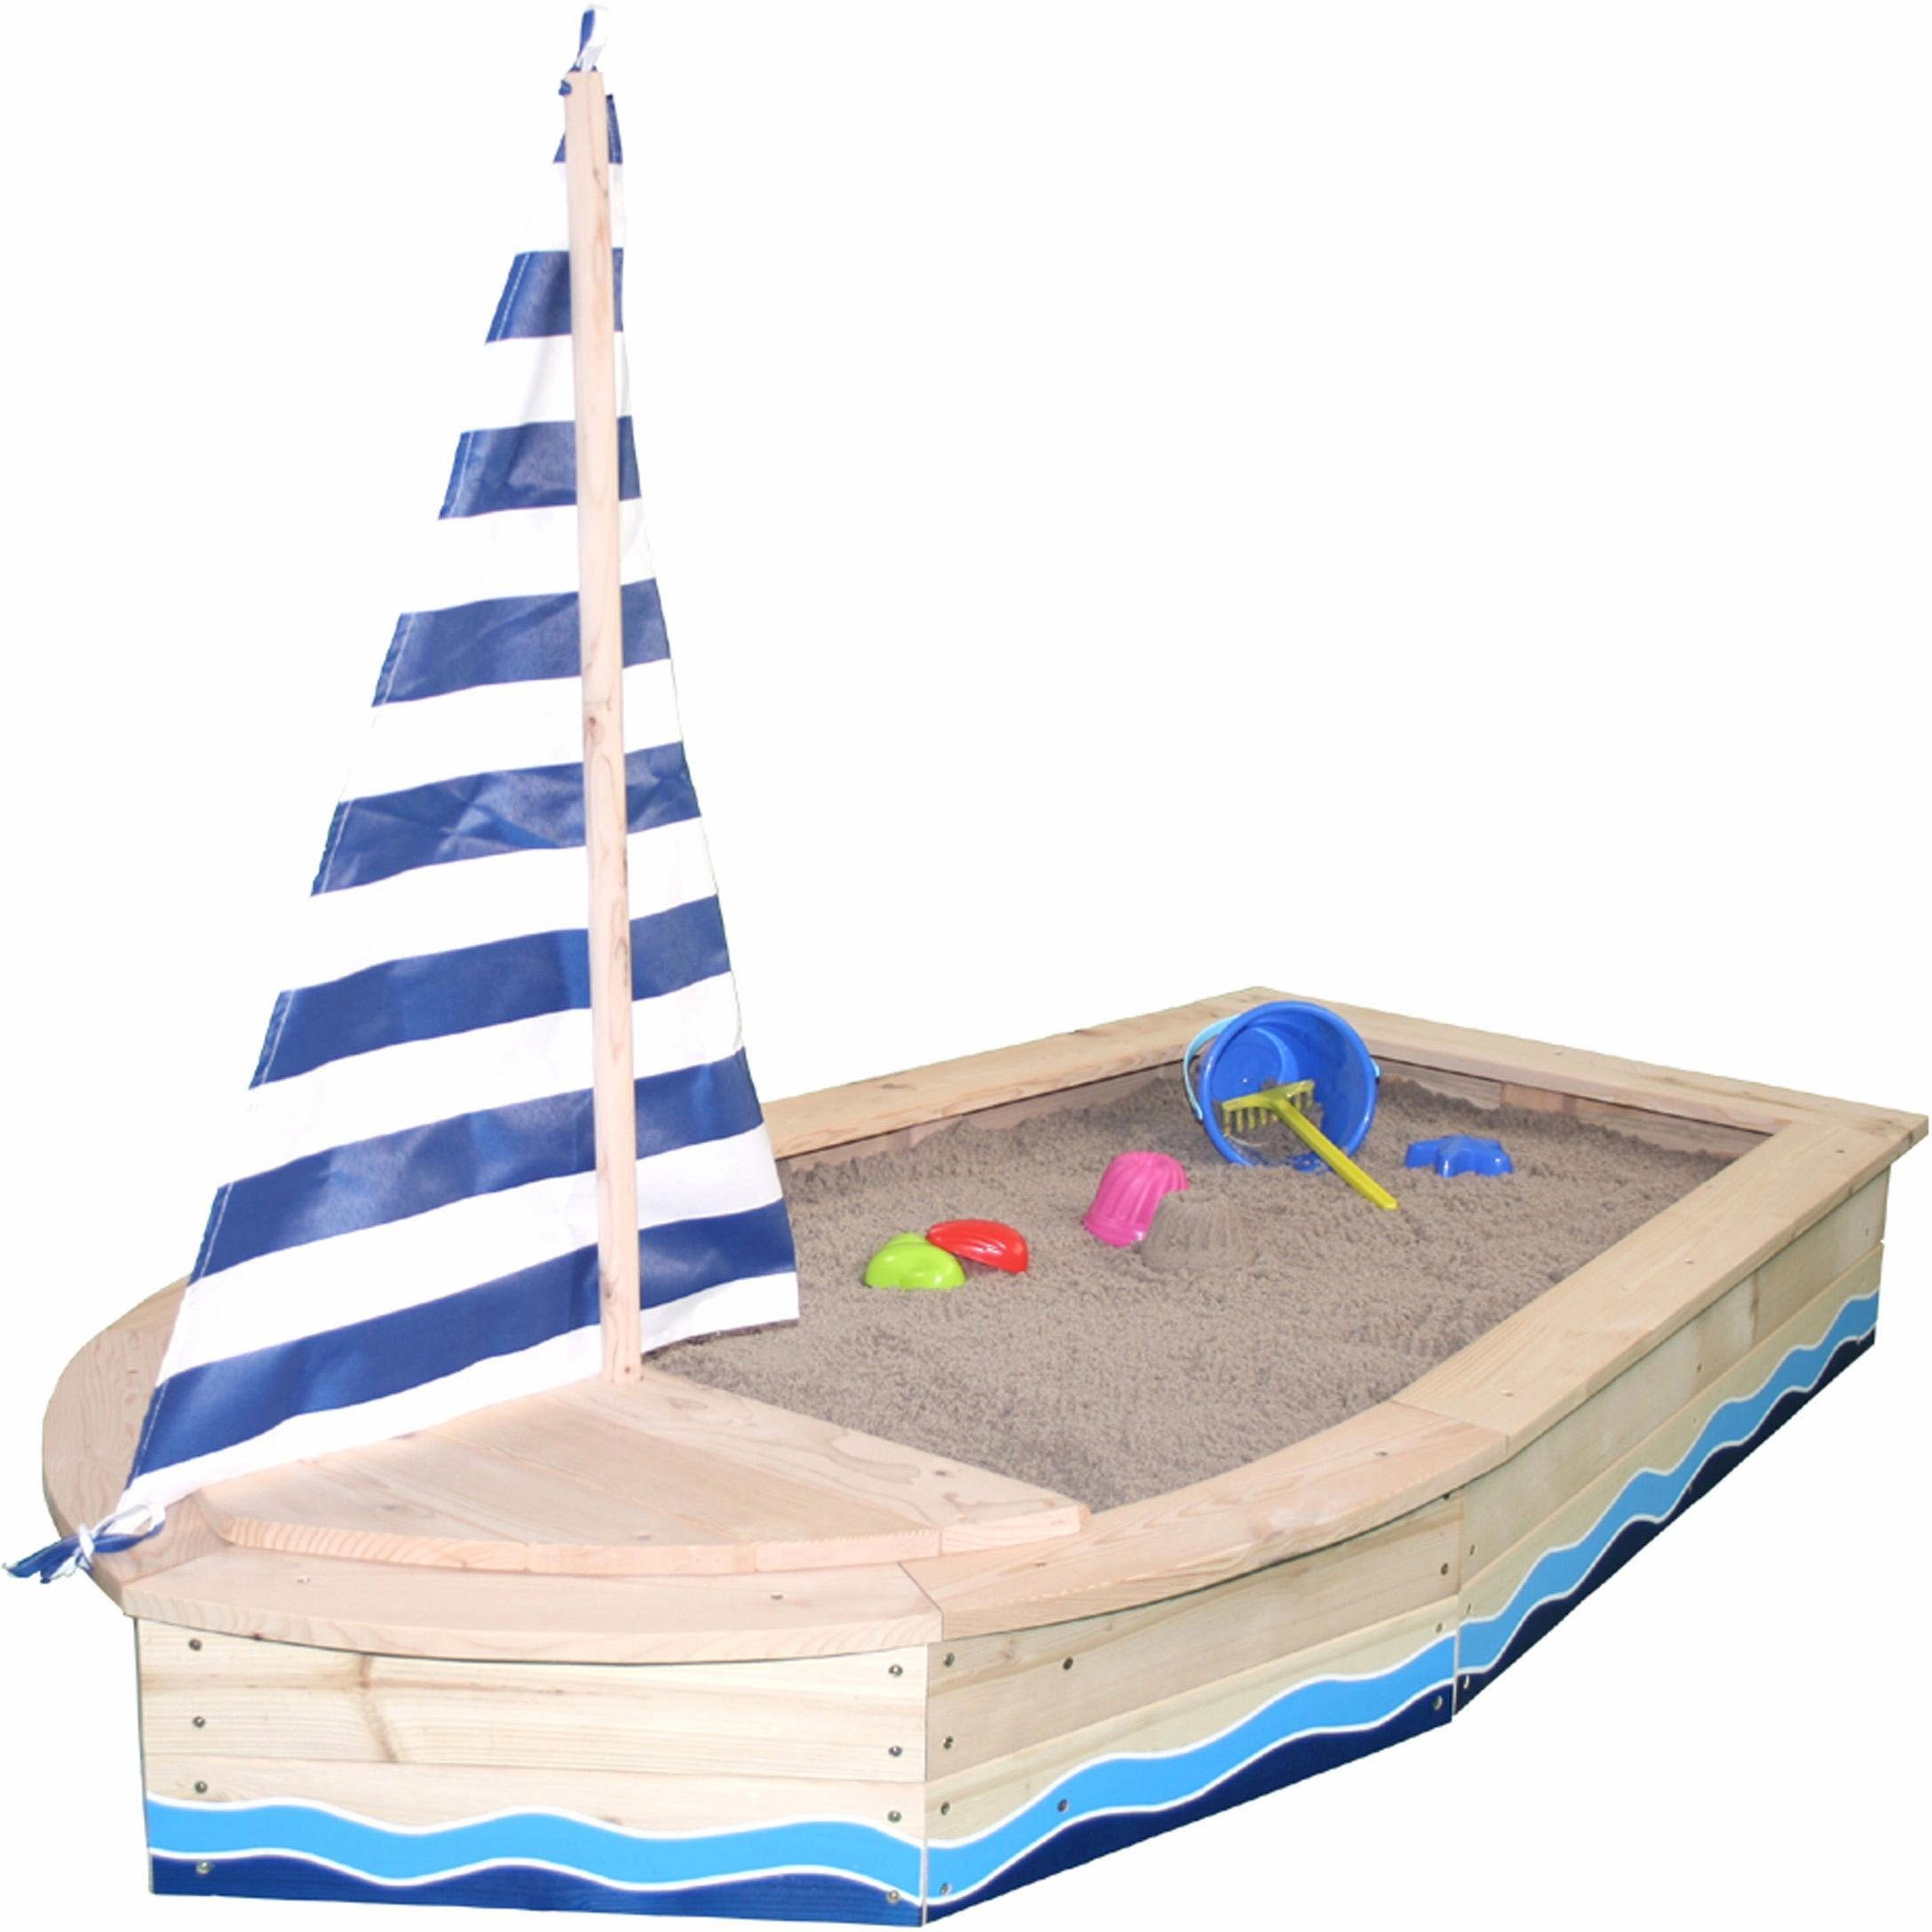 Sun Sandkasten aus Holz, »Bootsform, natur«